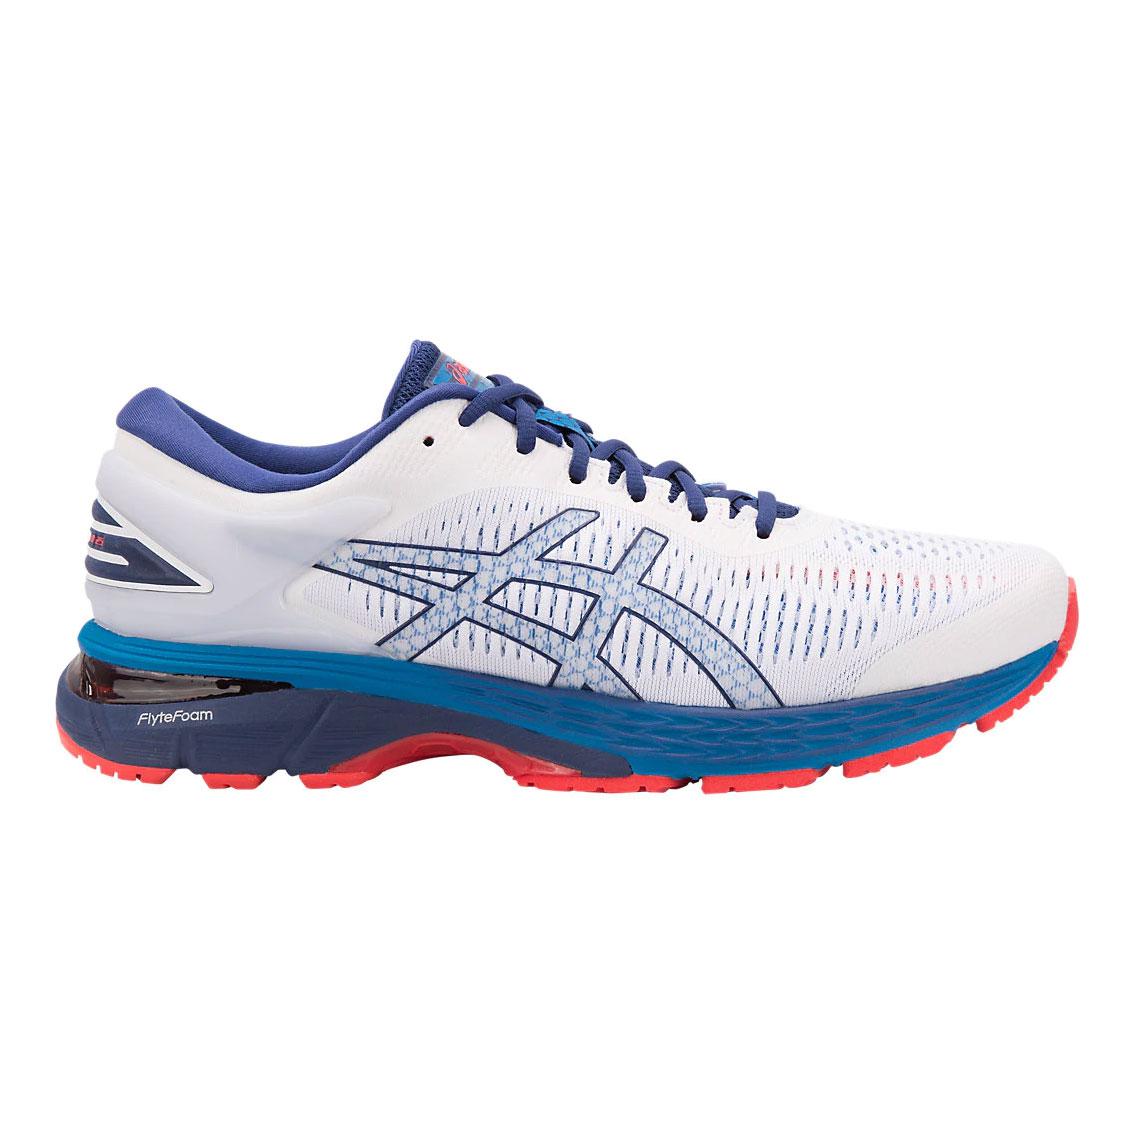 Asics Mens Gel Kayano 25 Running Shoe White Blue Print Mild Pronation 8ab5b207c9a2